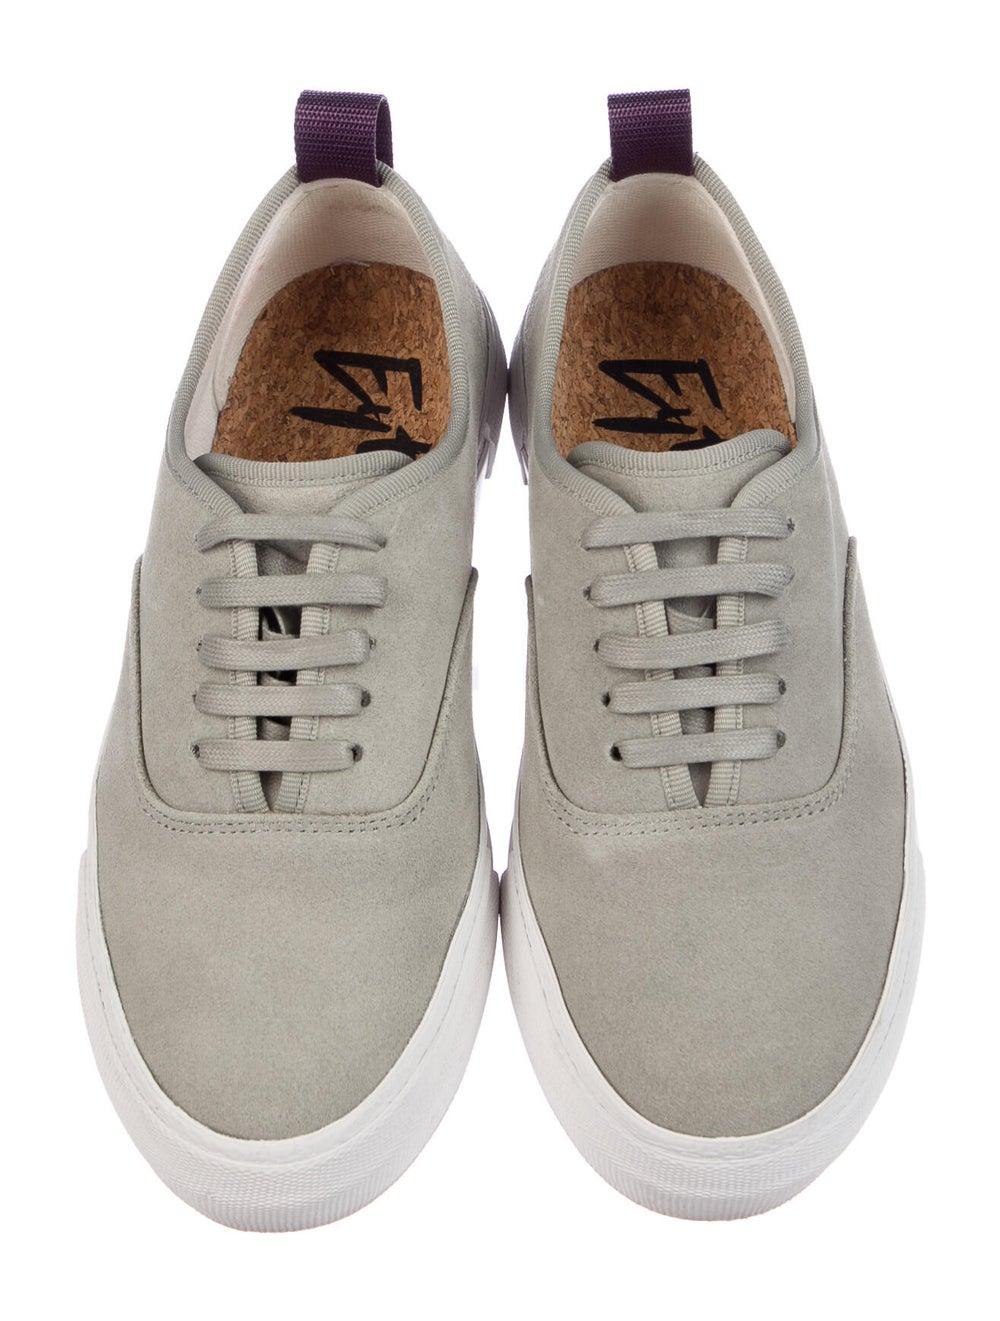 Eytys Suede Sneakers Green - image 3